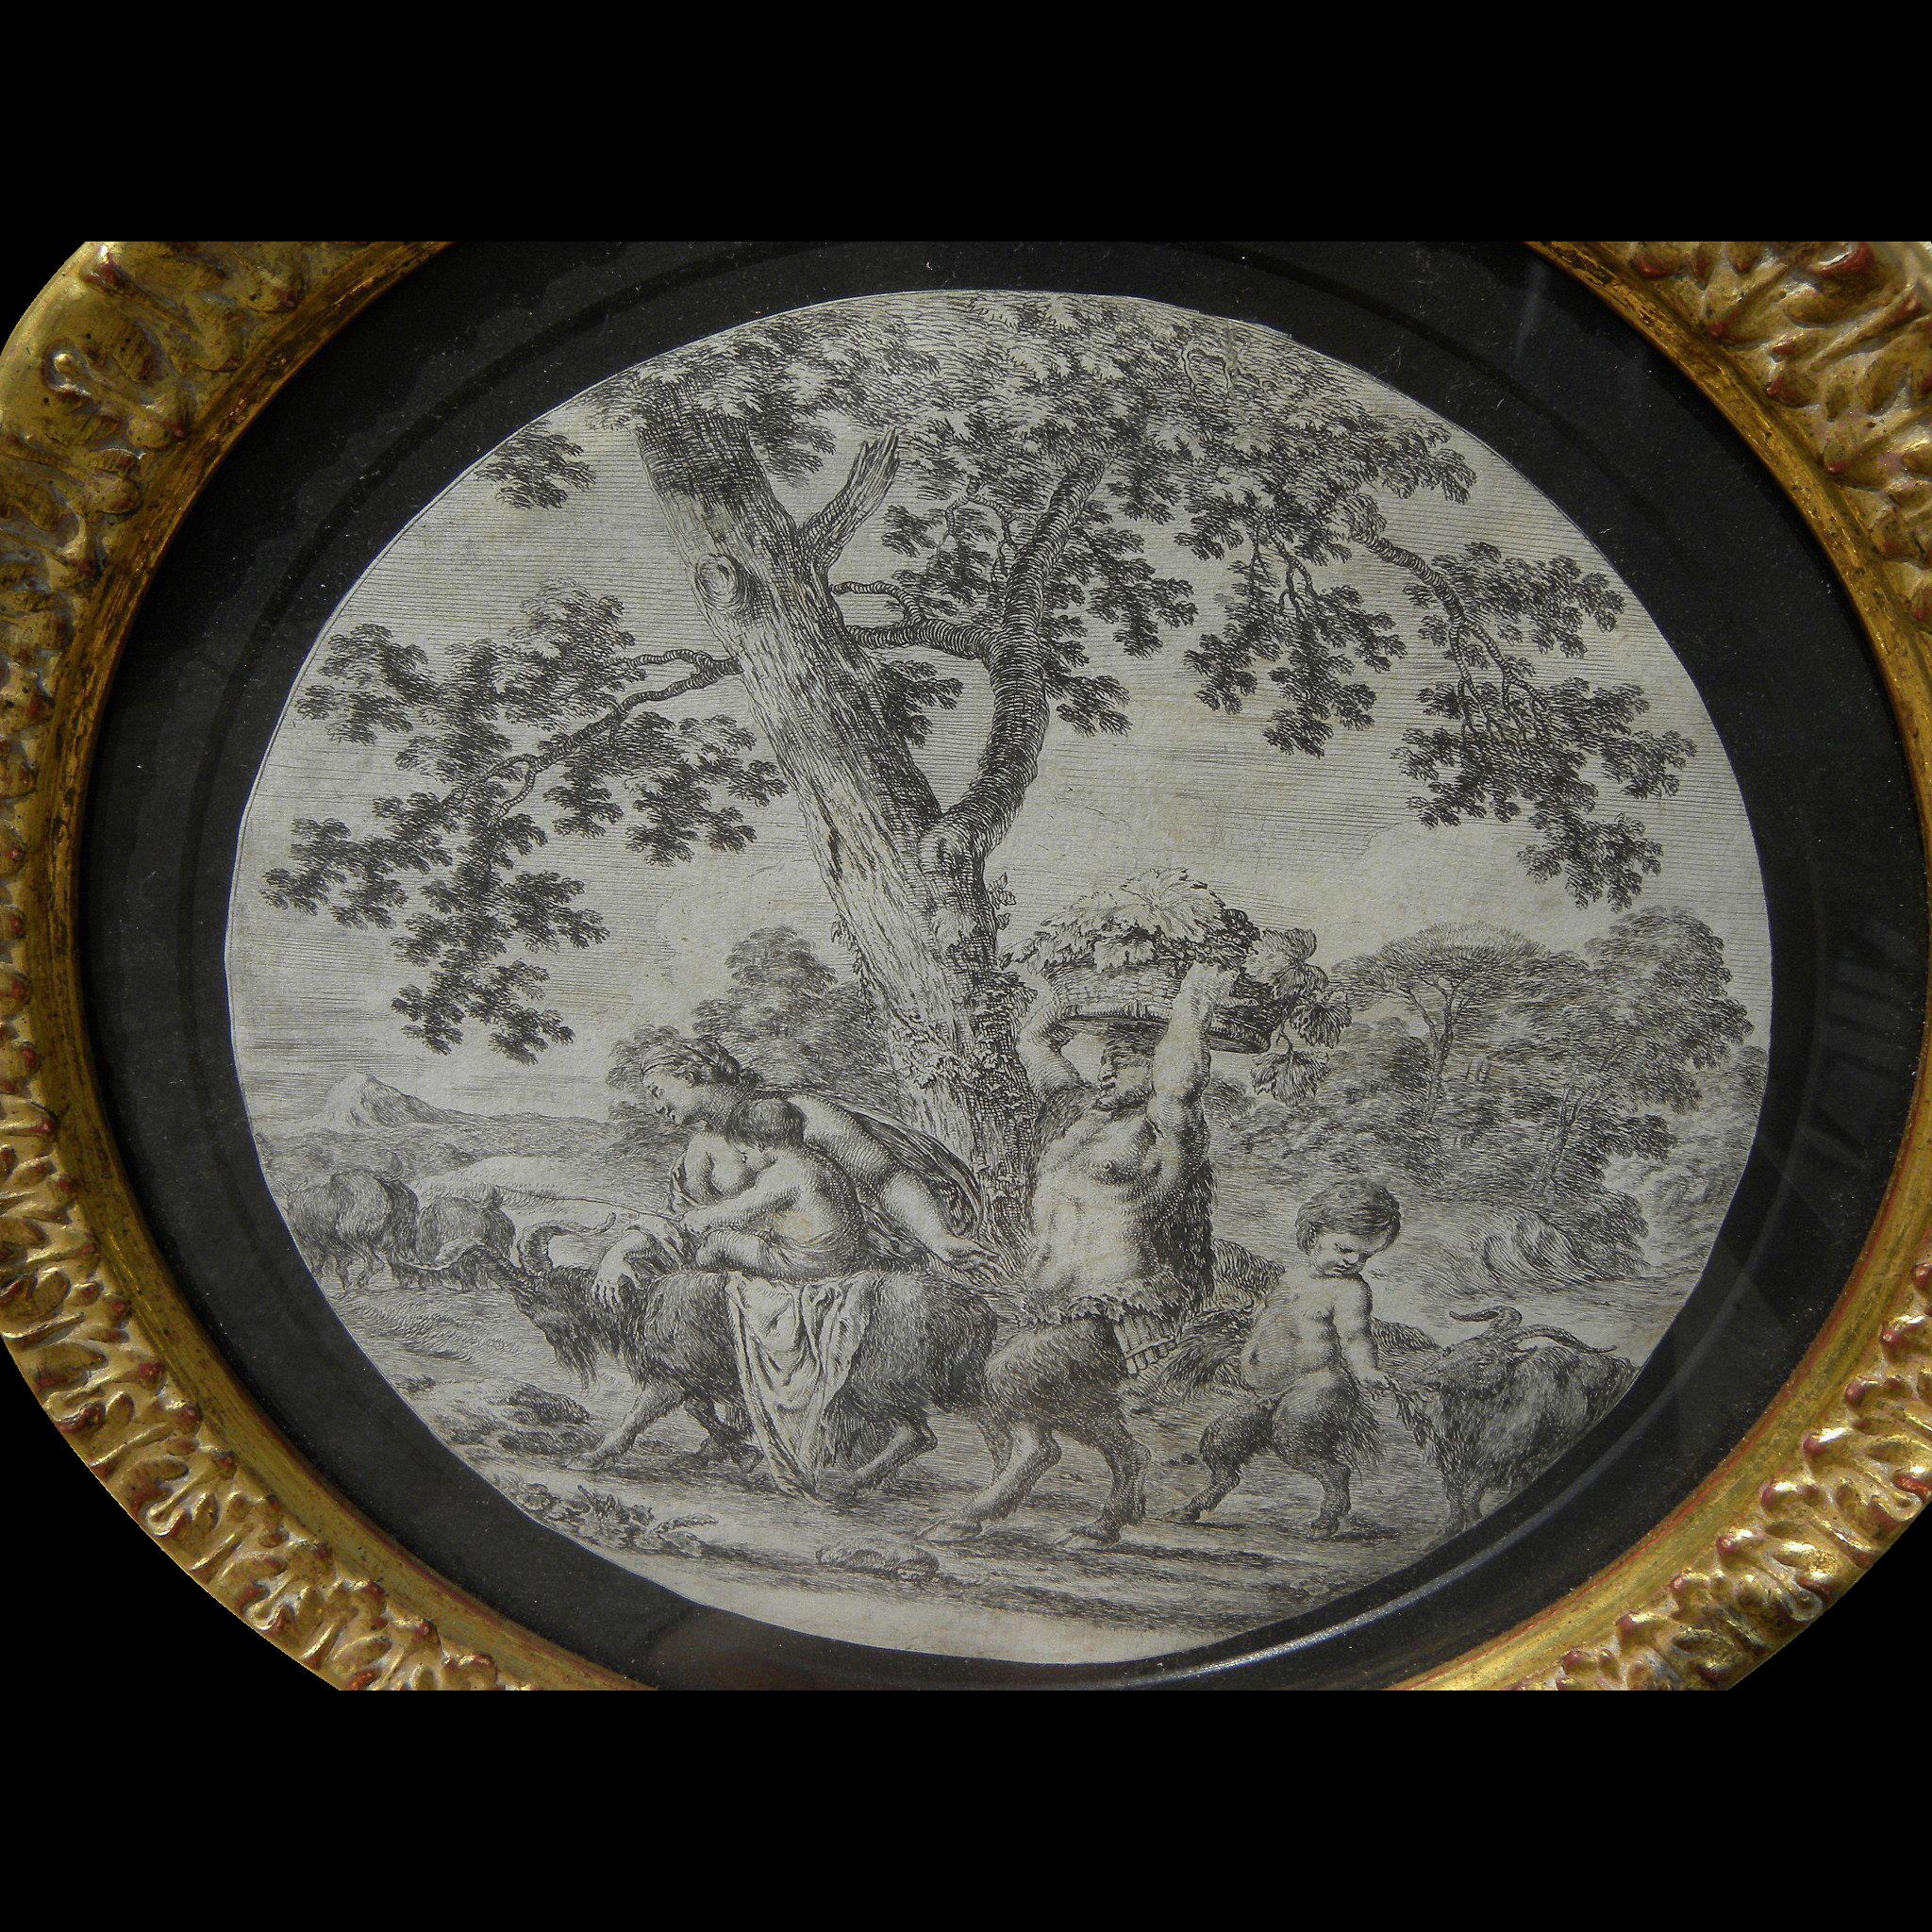 "STEFANO DELLA BELLA (1610-1664) Italian art etching ""The Satyr Family"" 1657"